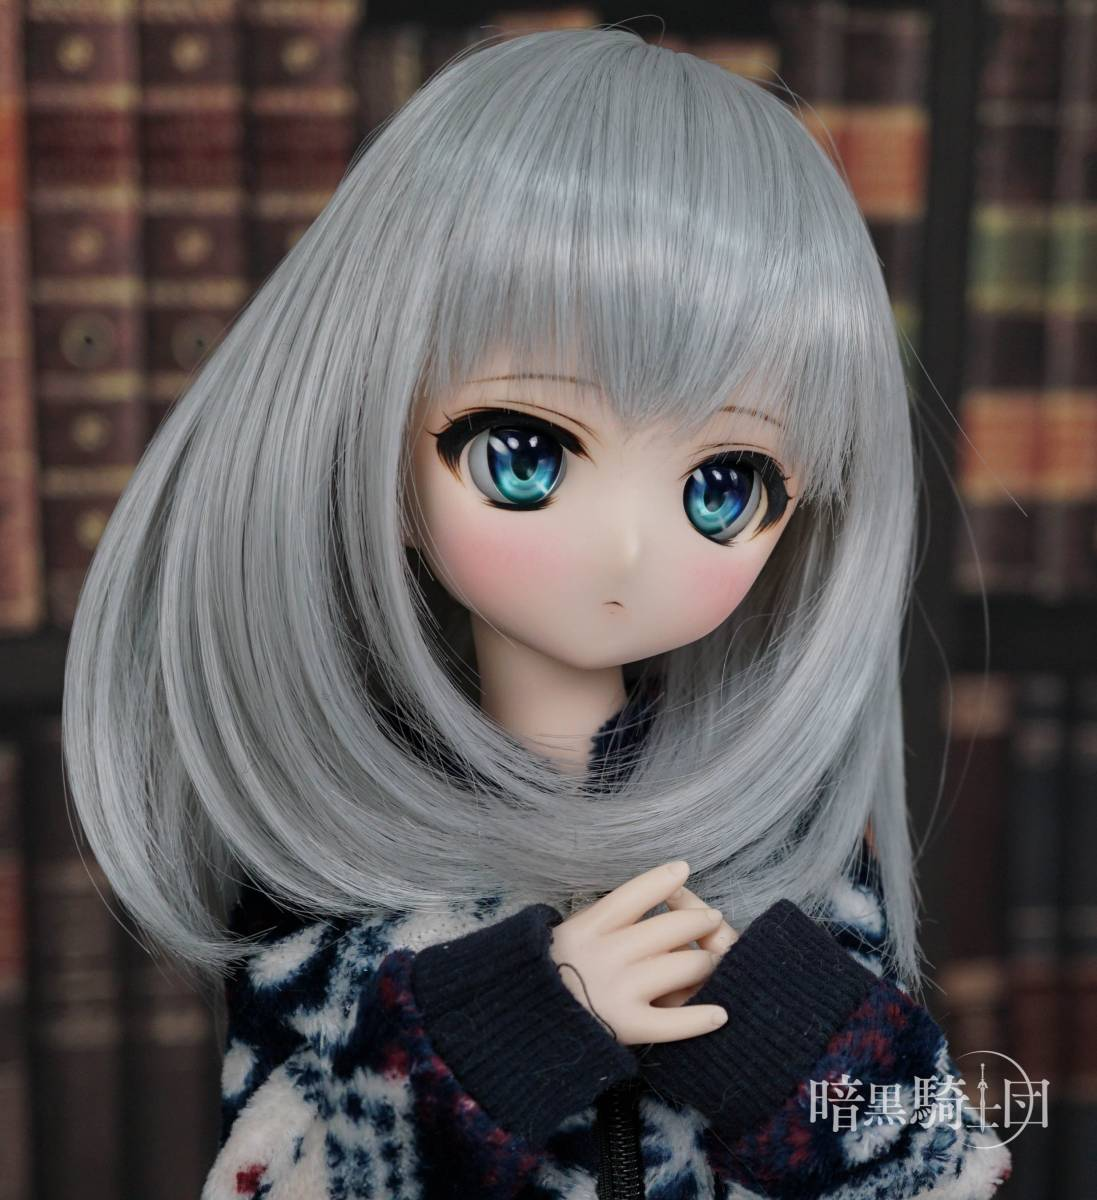 DDH-01ノーマル肌カスタムヘッド+アイ一組 ◇暗黒騎士団◇_画像4